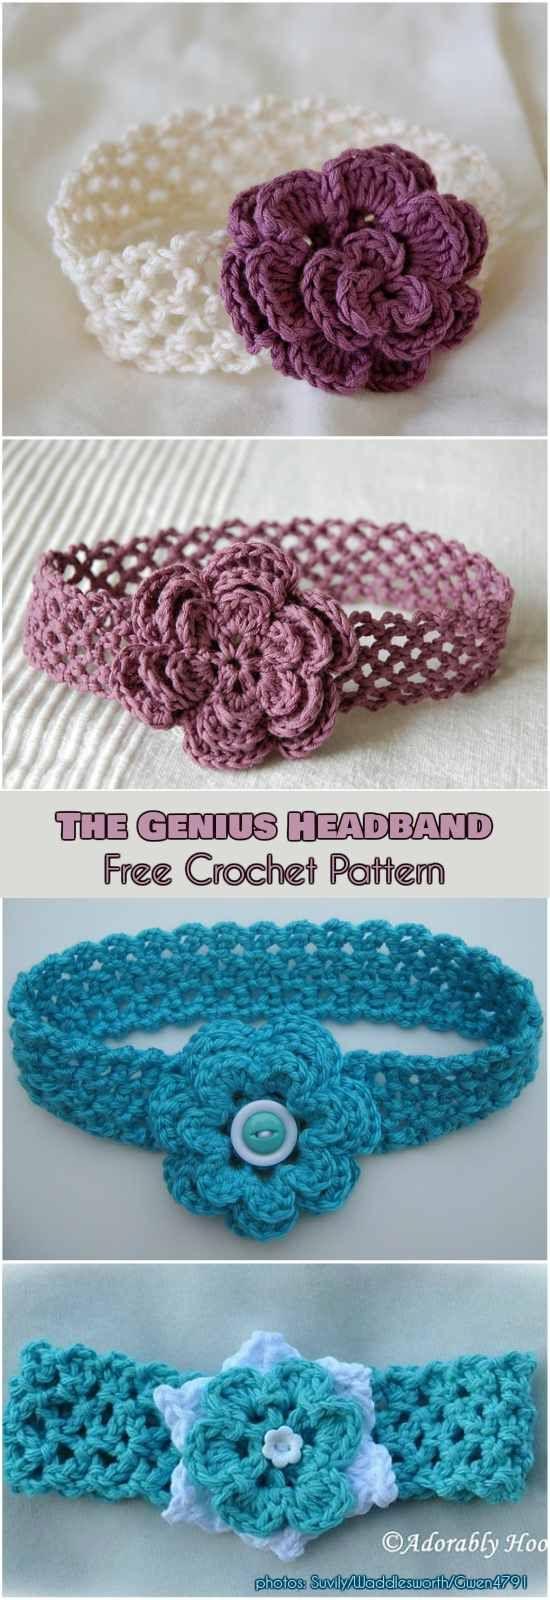 The Genius Headband with Flower Free Pattern #crochetedheadbands